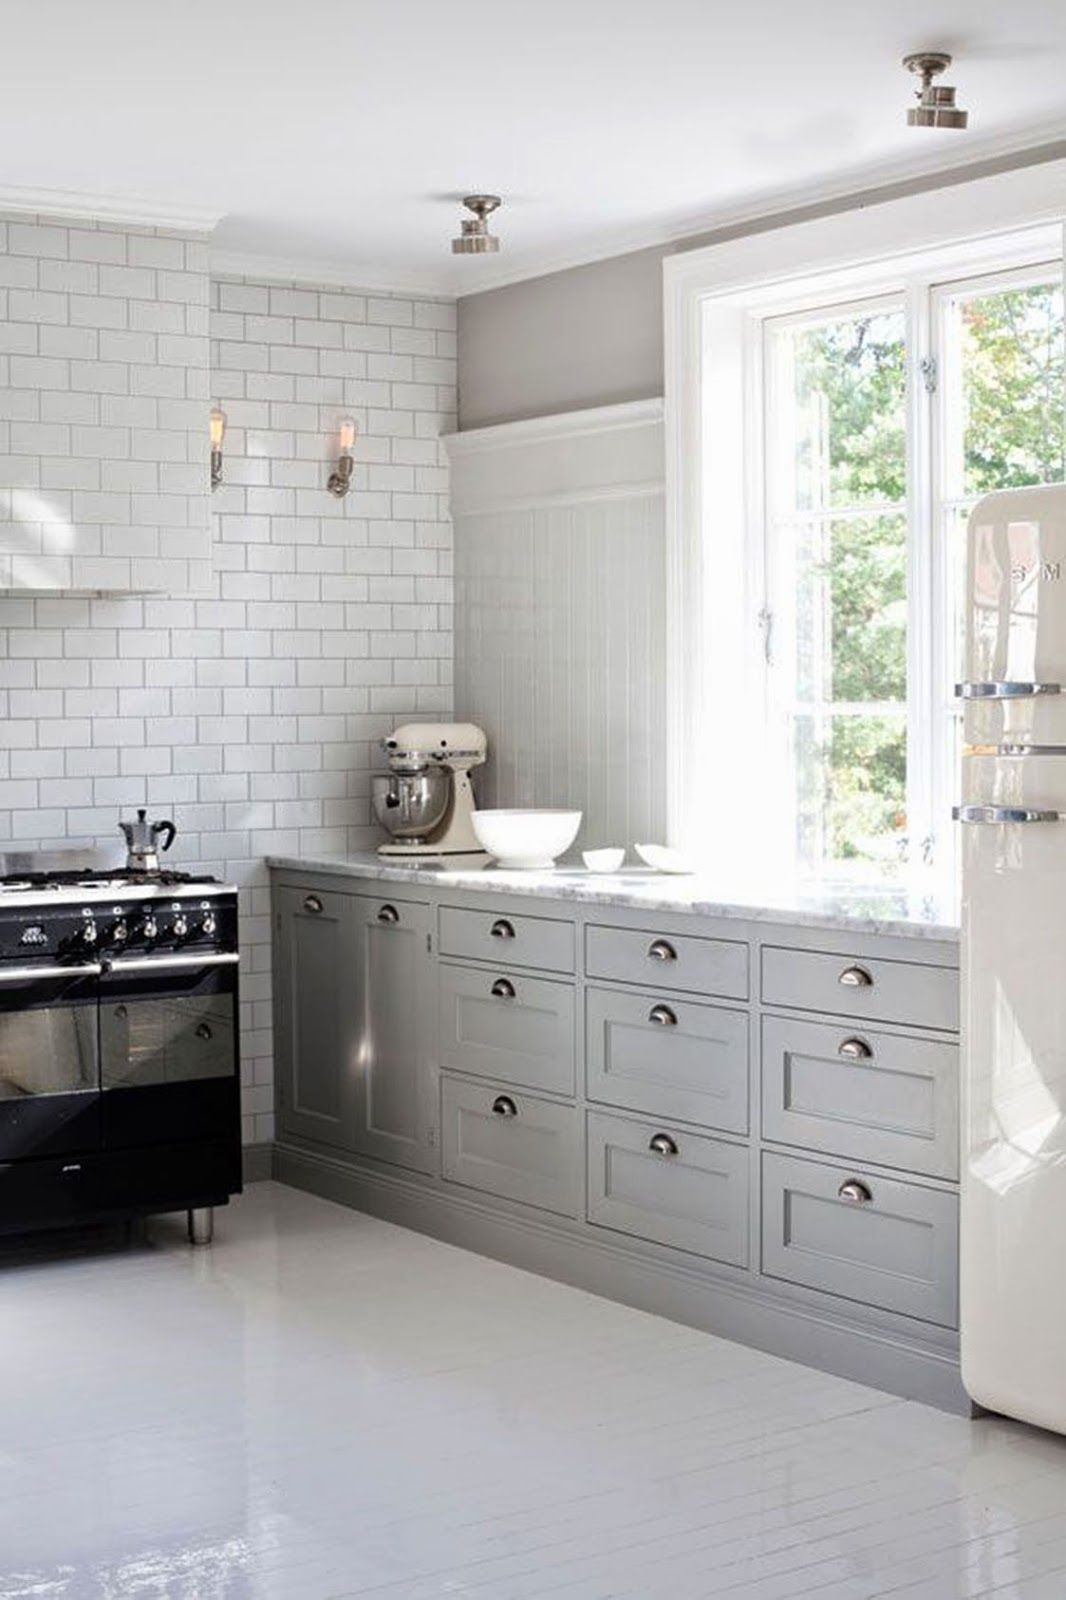 Kitchen design inspiration for Hummingbird High's kitchen remodel.